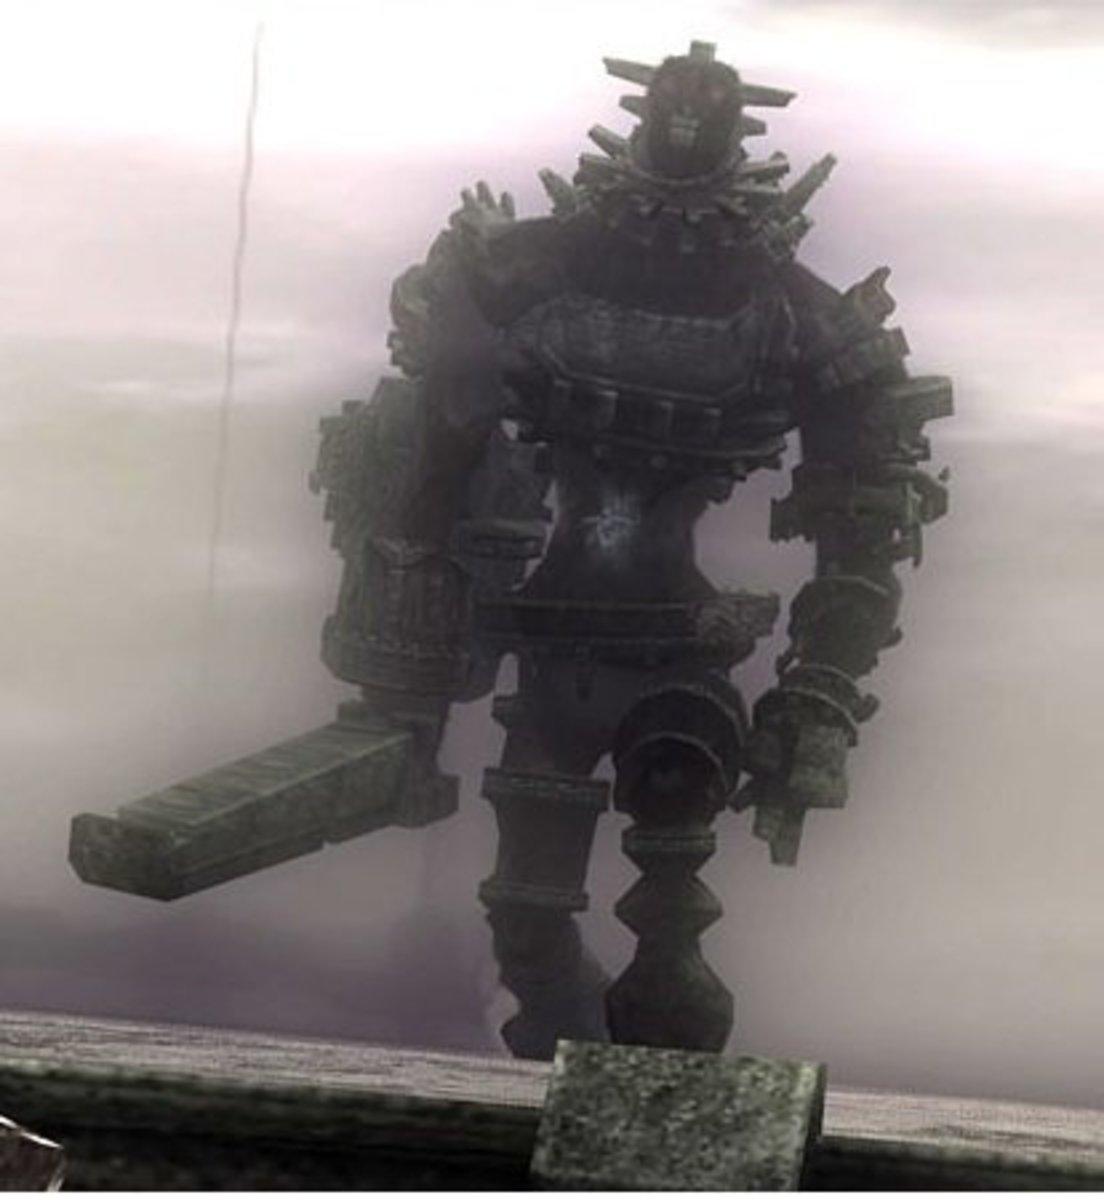 Colossus 3